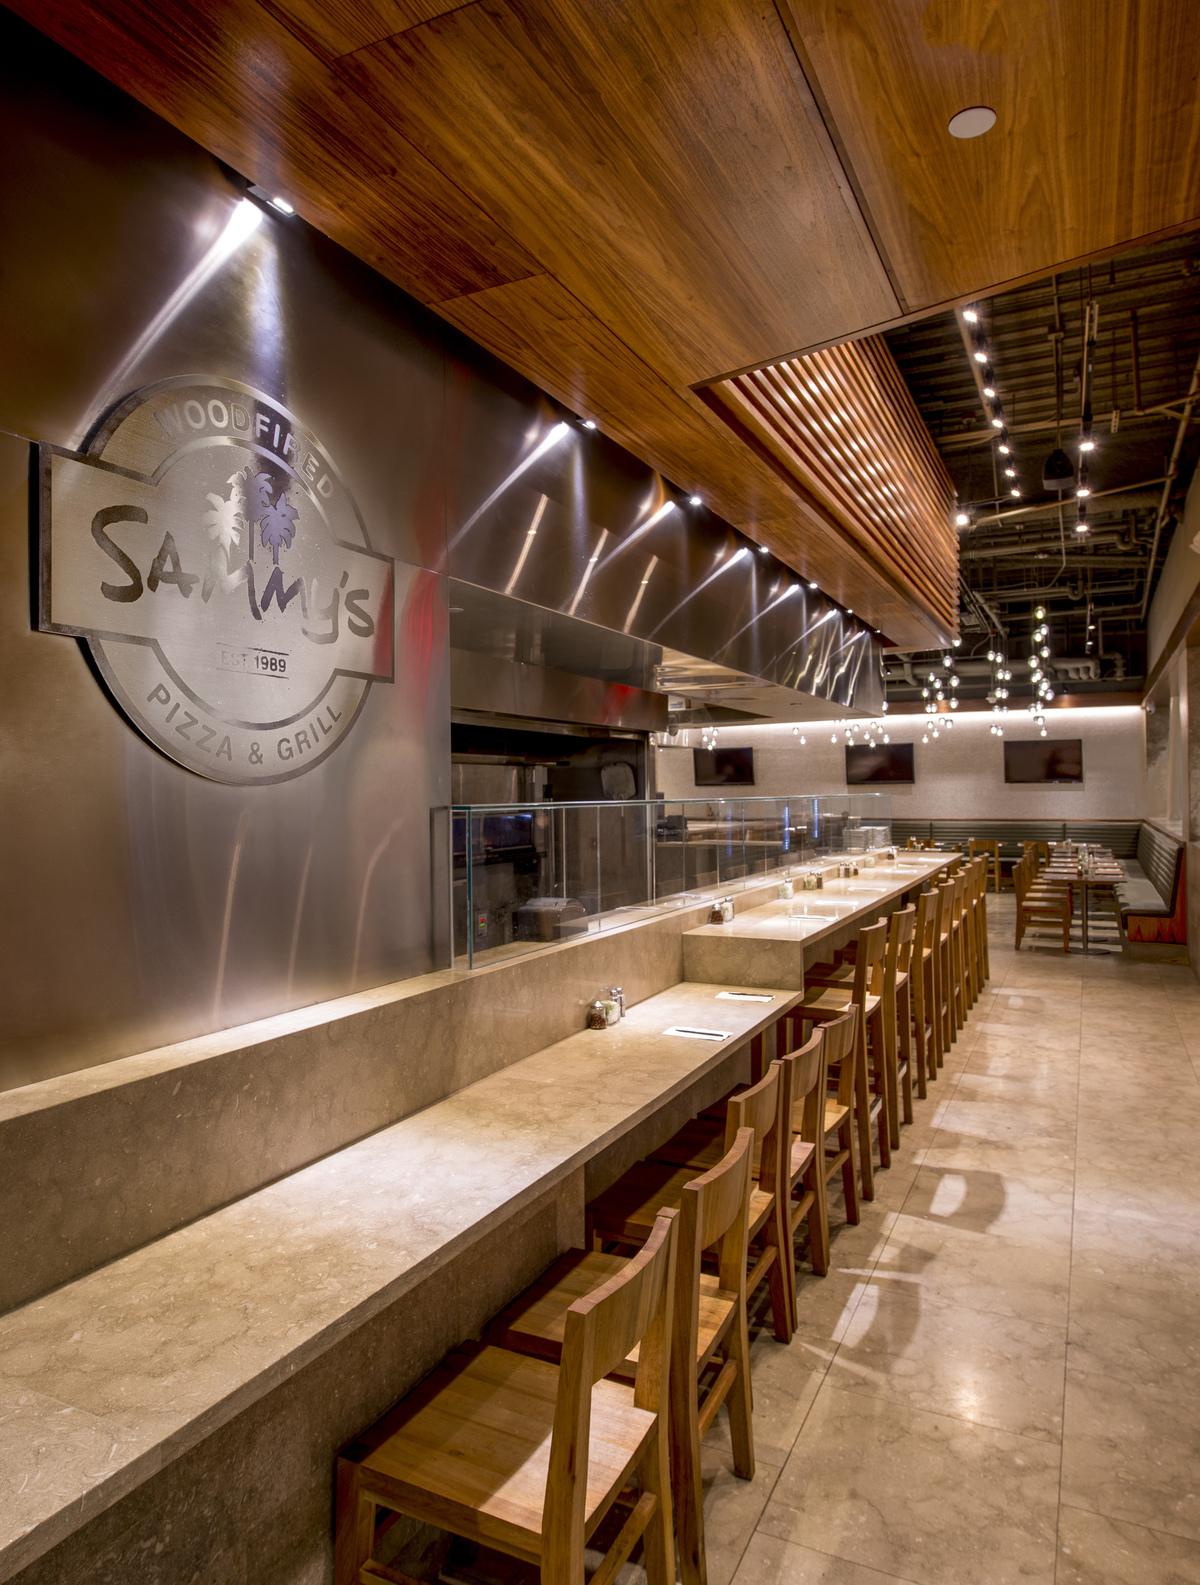 Sammys Woodfired Pizza at LAX T-4. Photo © Steve King